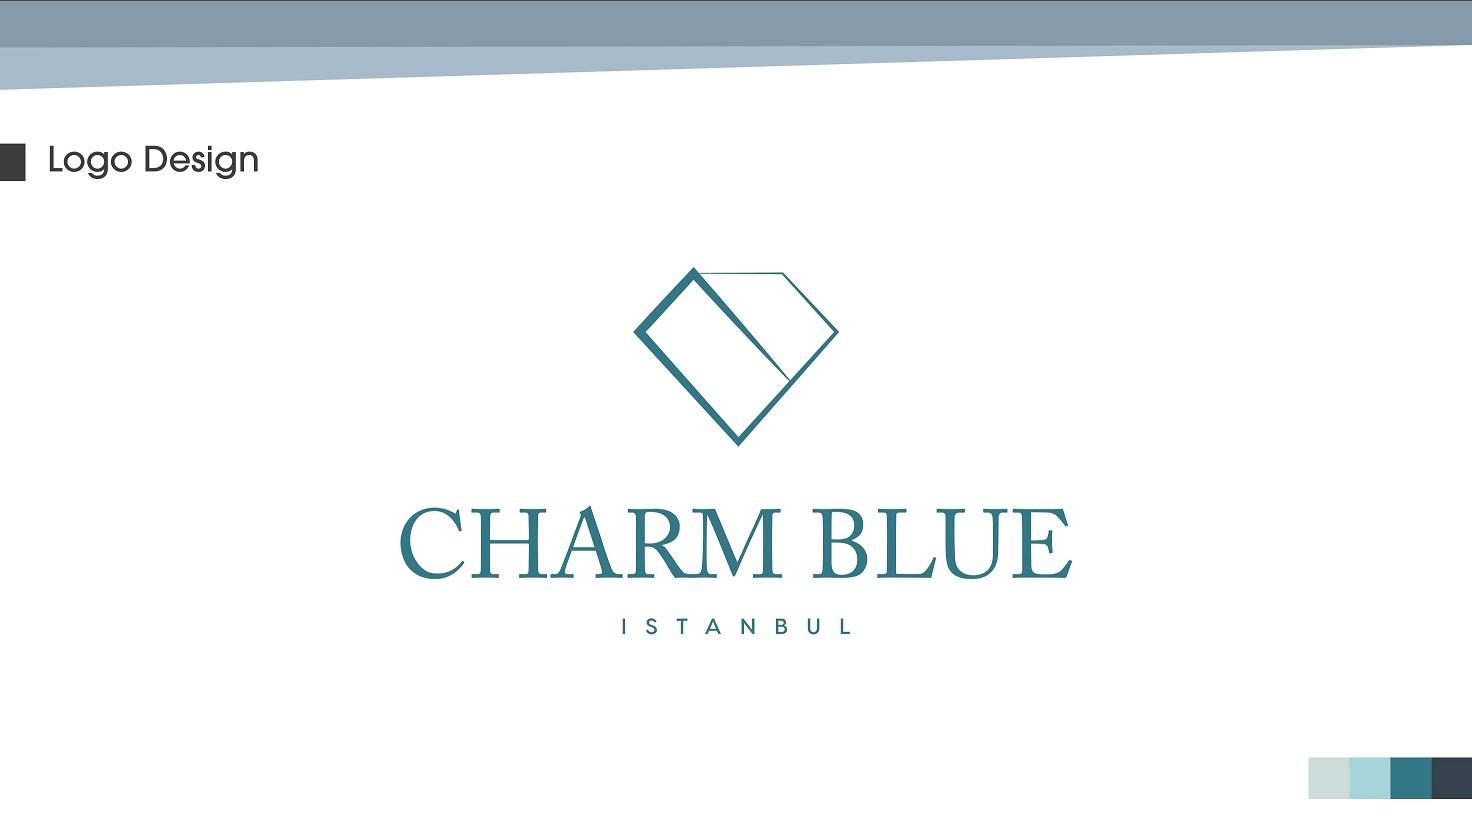 Charm Blue